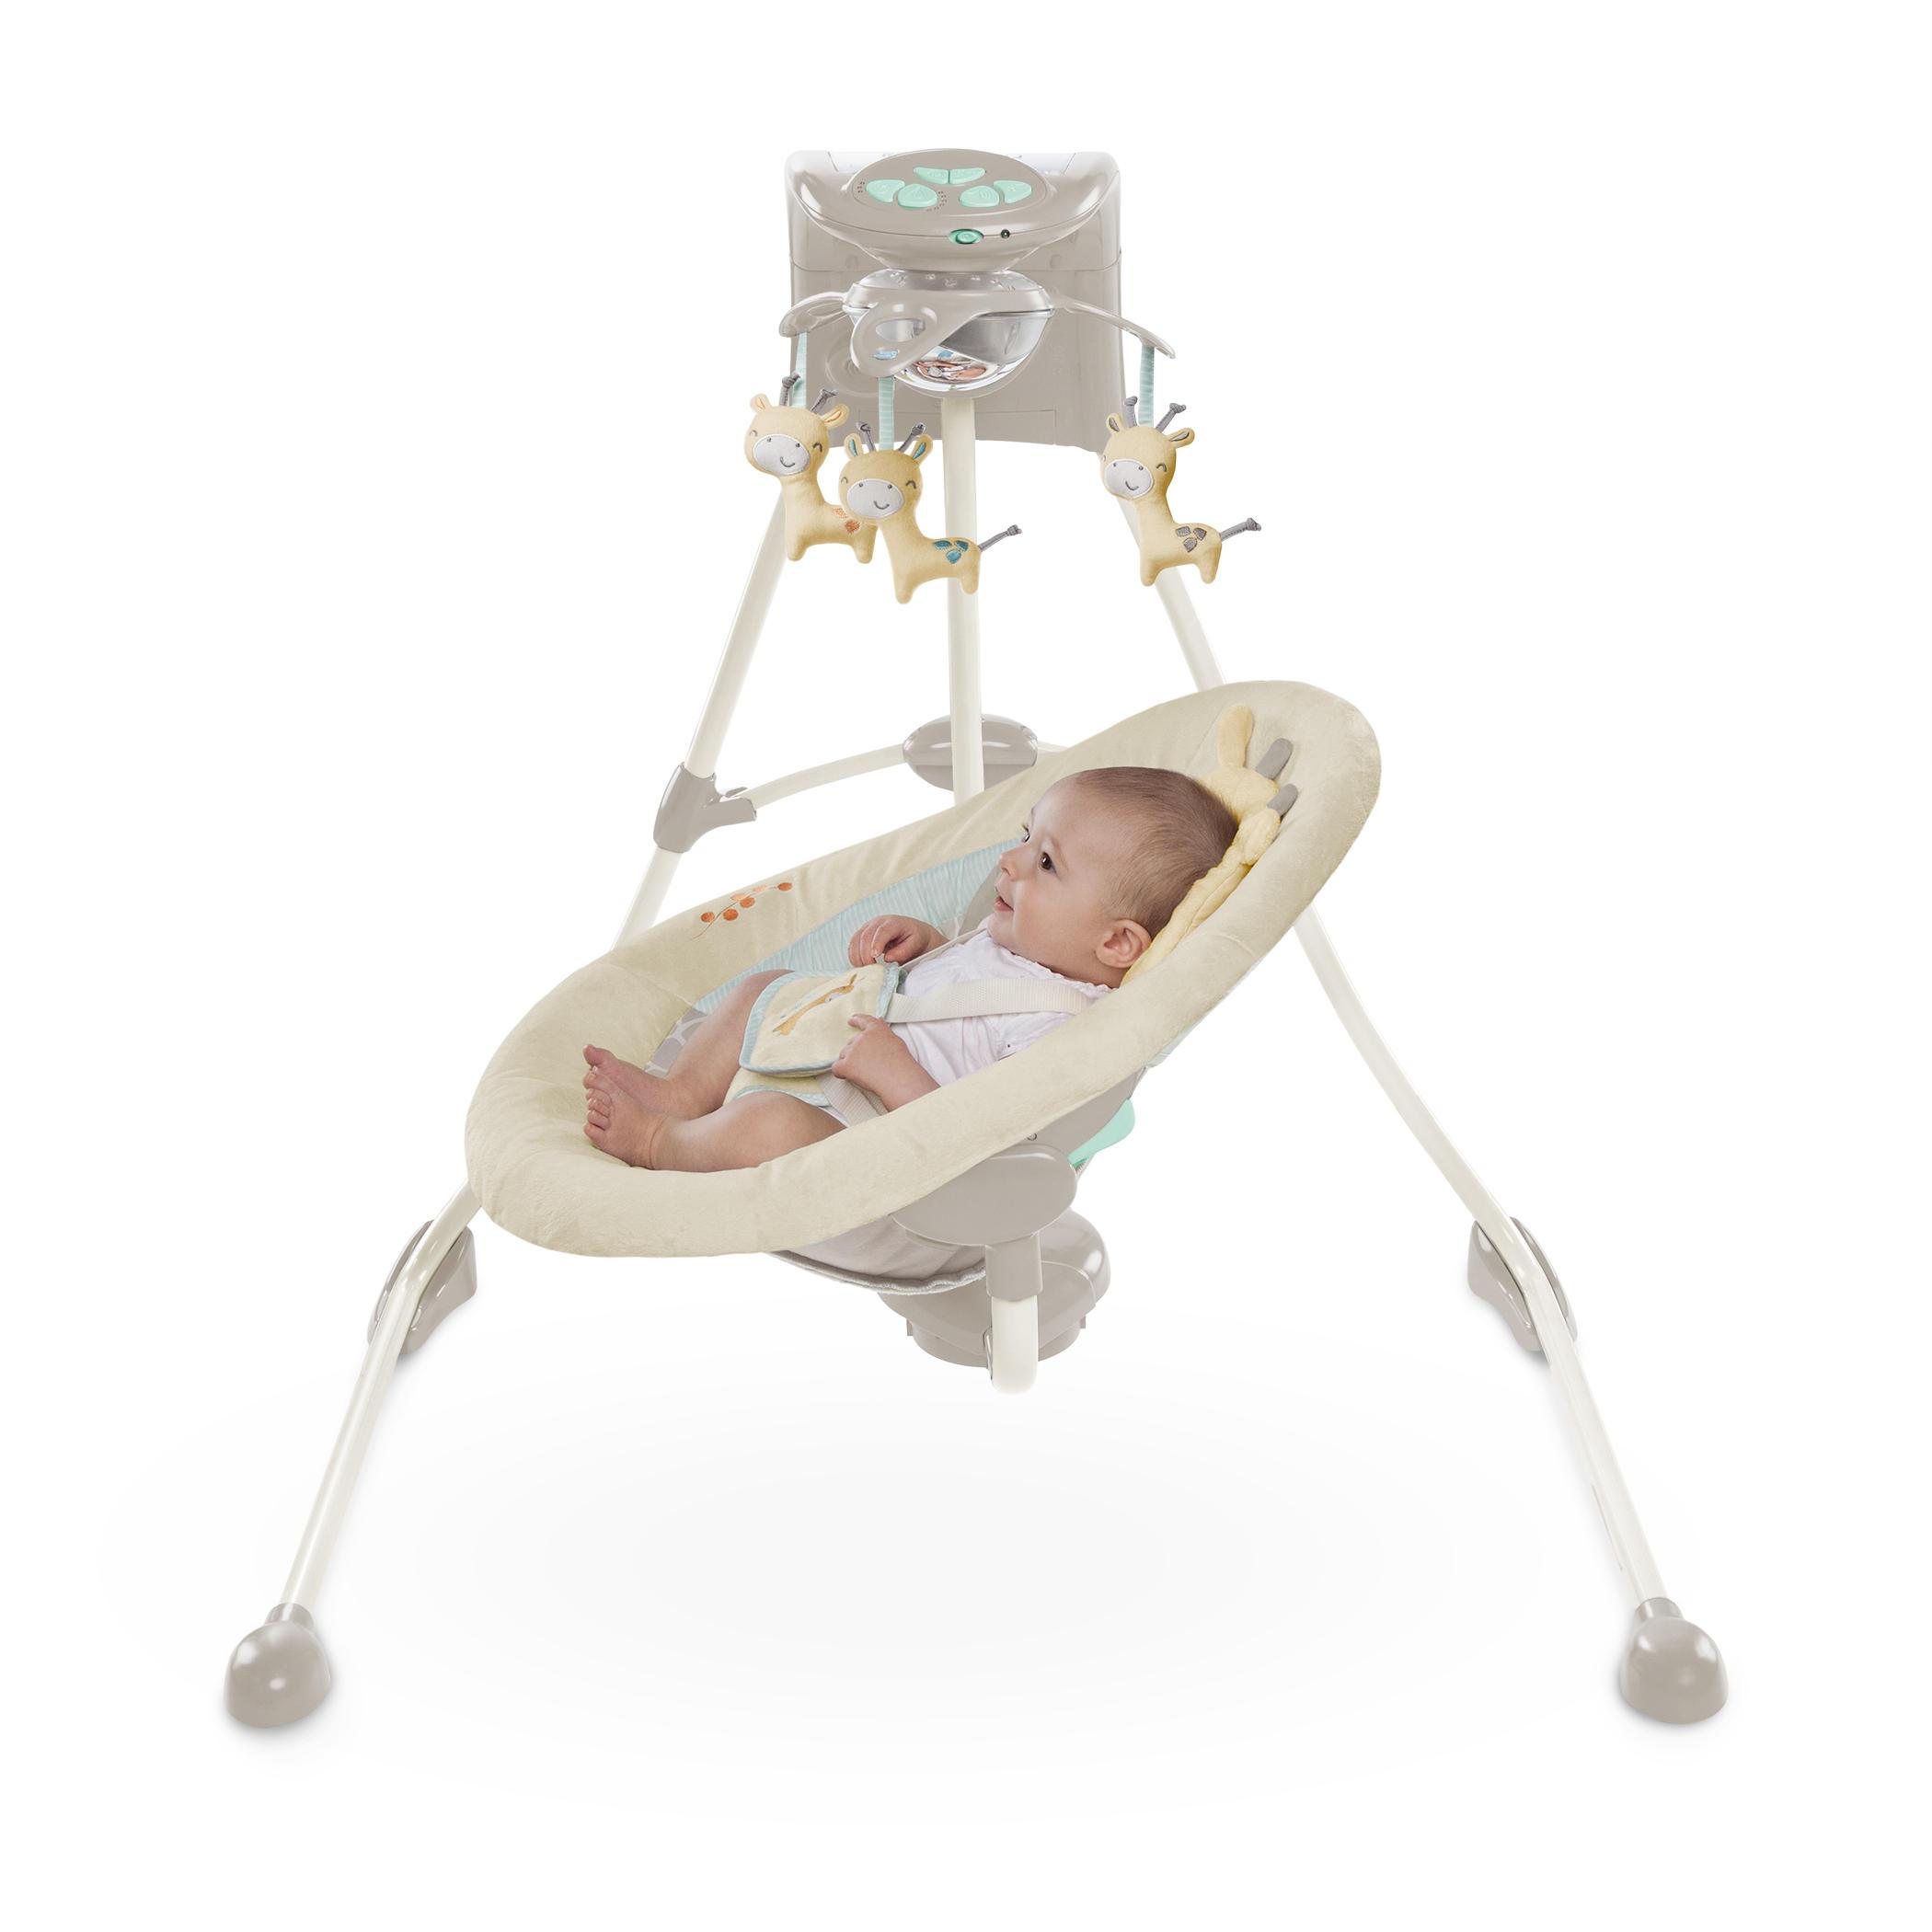 InLighten Cradling Swing™ - Cuddle Giraffe™